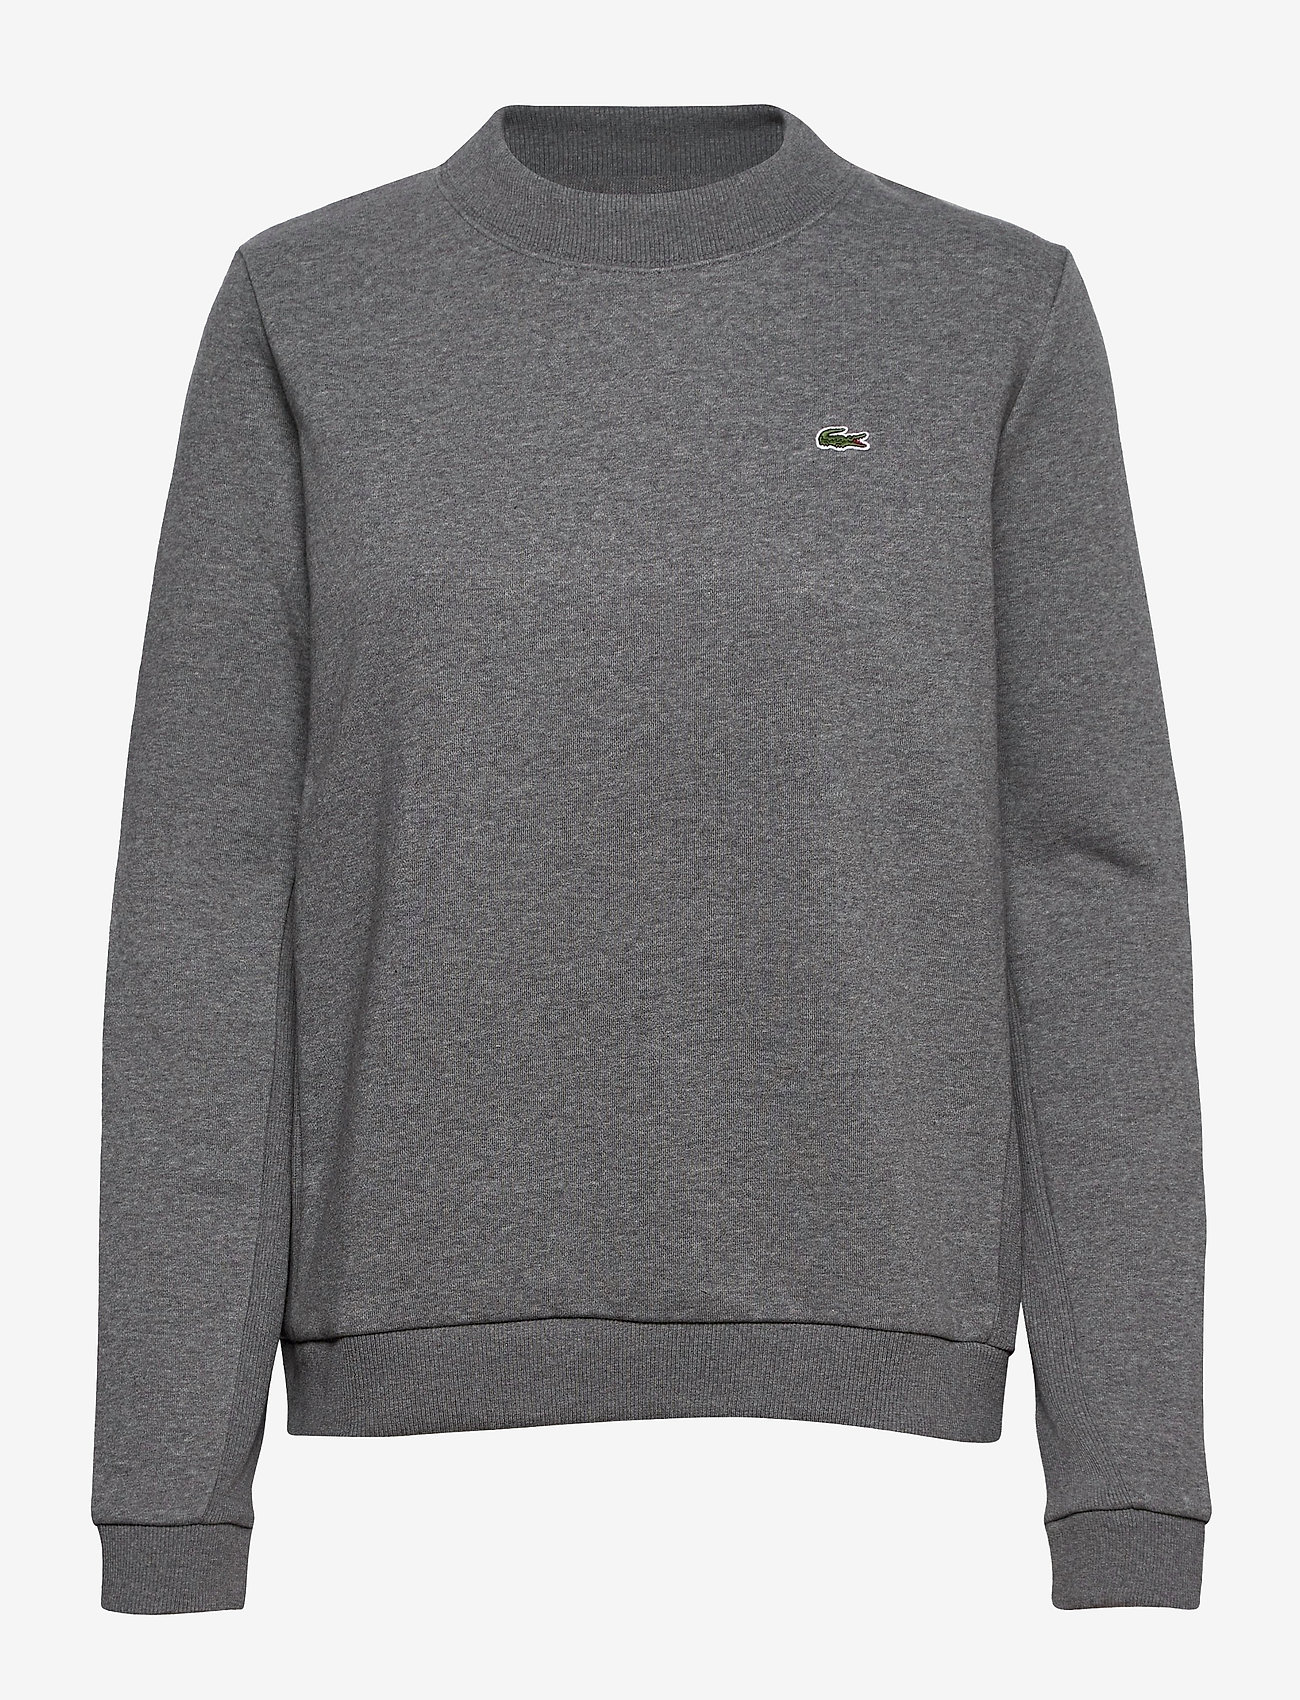 Lacoste - Women s sweatshirt - sweatshirts - pitch chine - 0